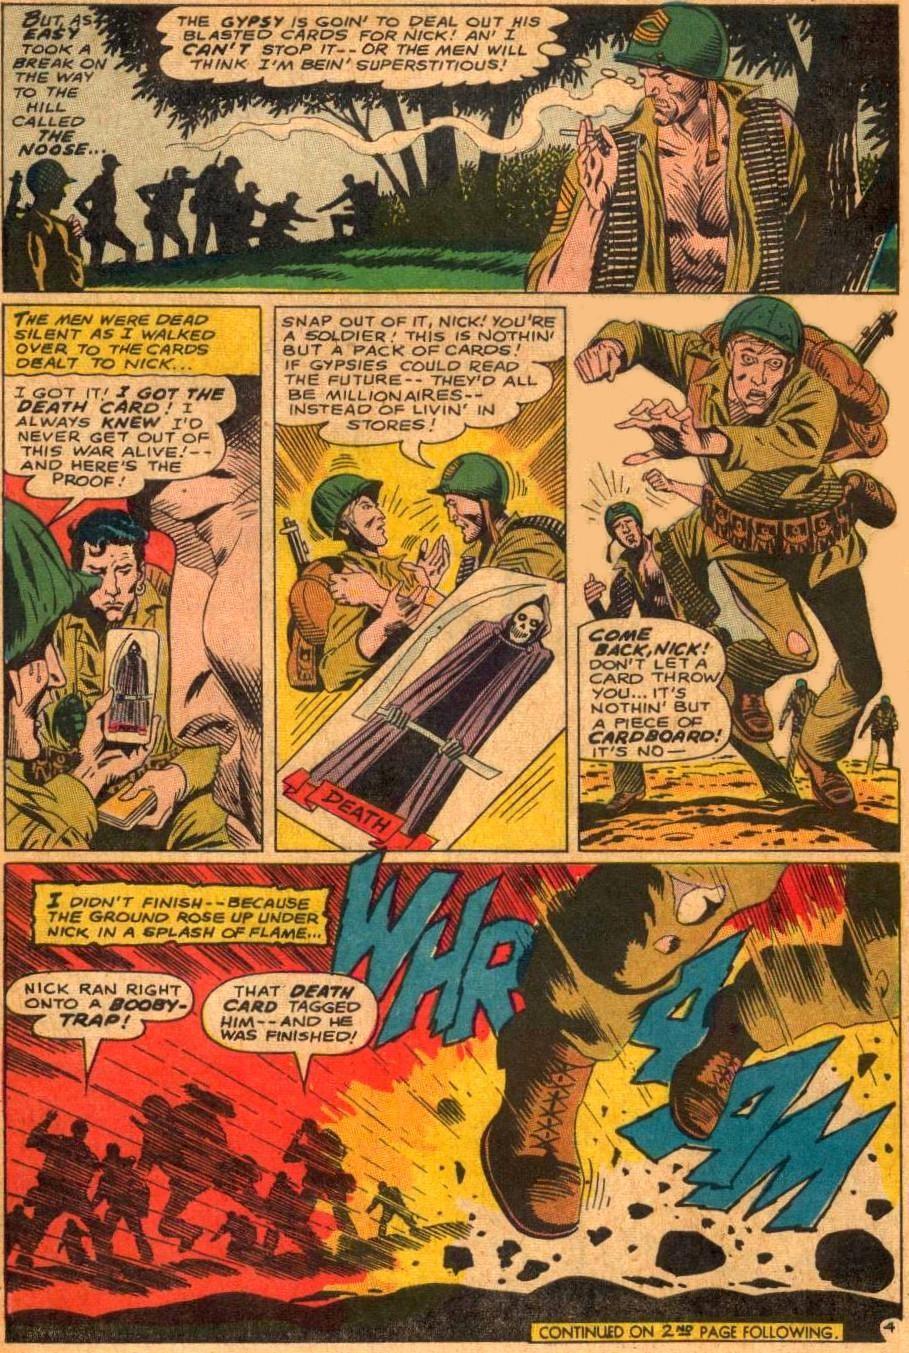 The Daily Kirby: Joe Kubert Depicted The First Tarot Card